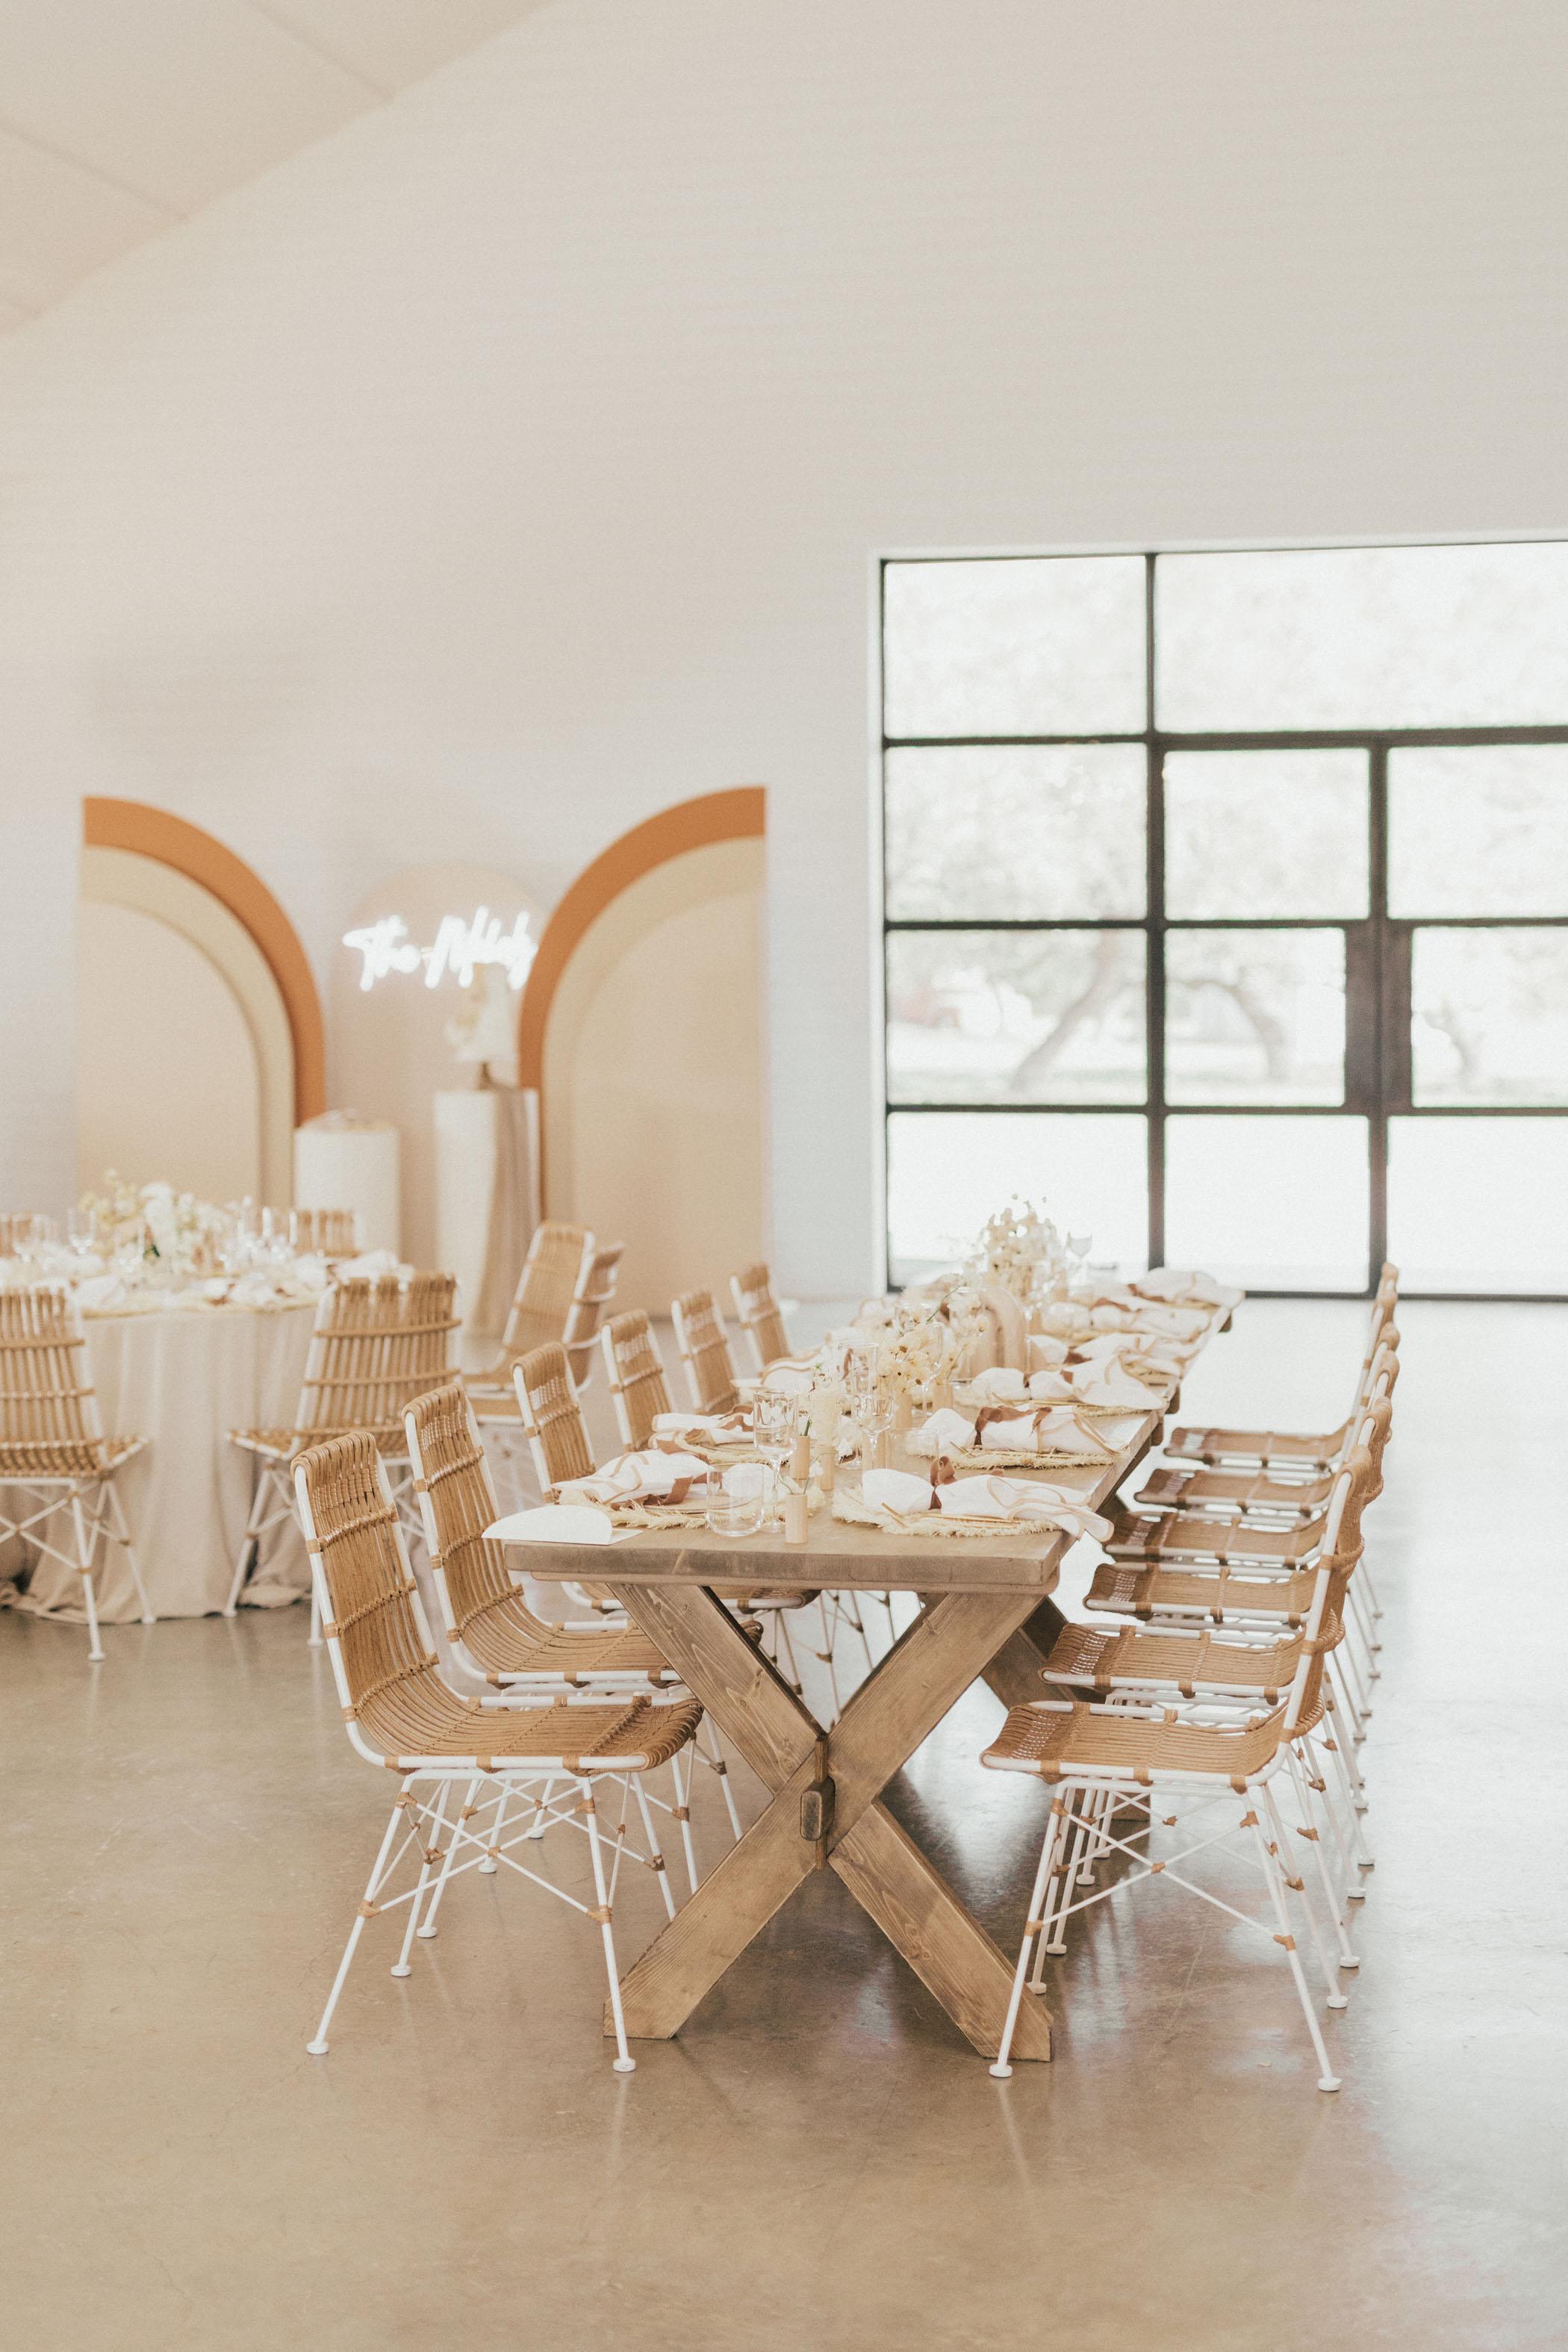 Texas Barn Wedding Reception with Neutral Decor